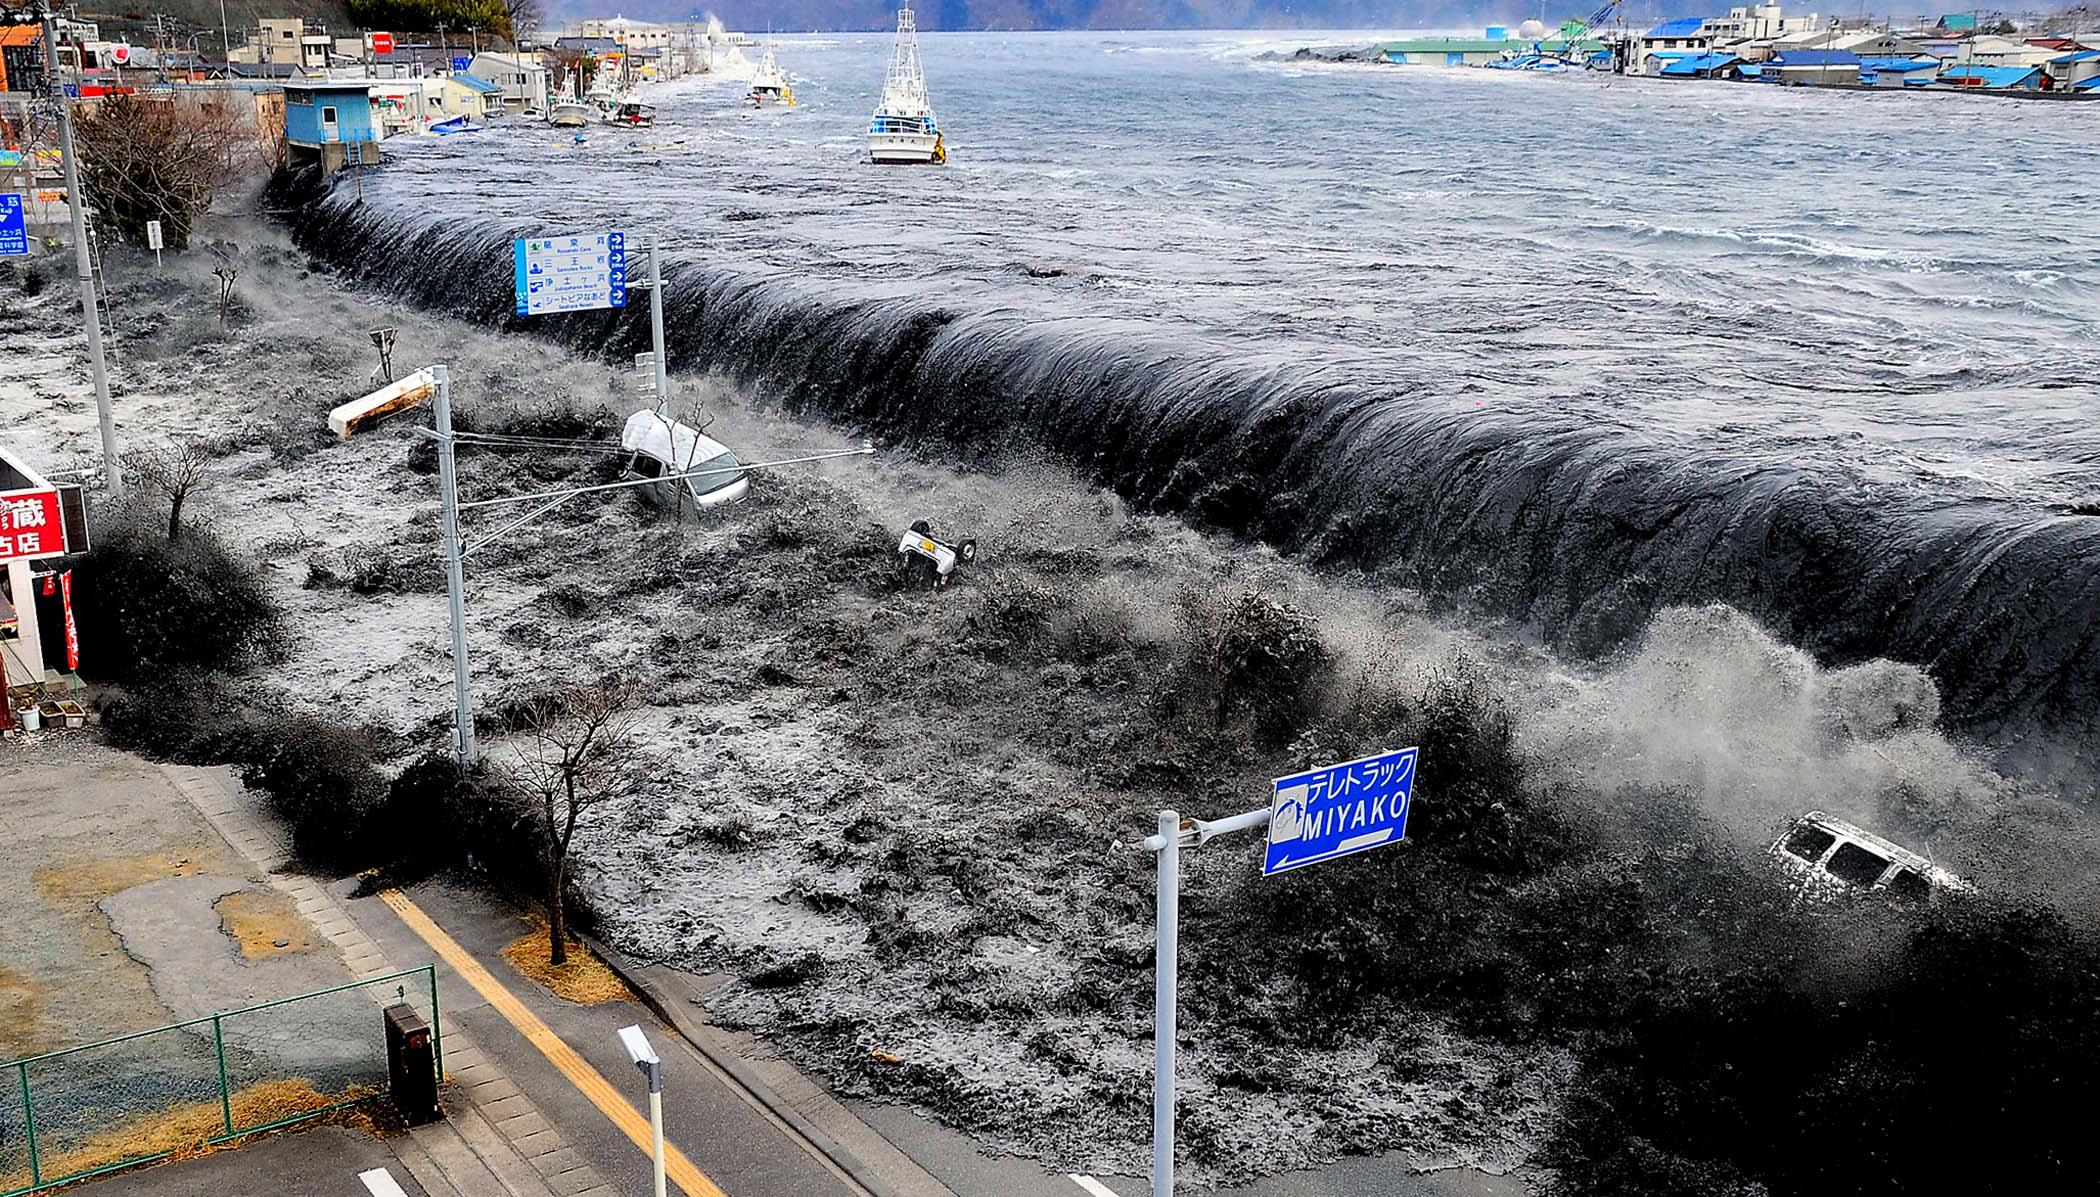 3 - 2011 Japan Tsunami initial wave